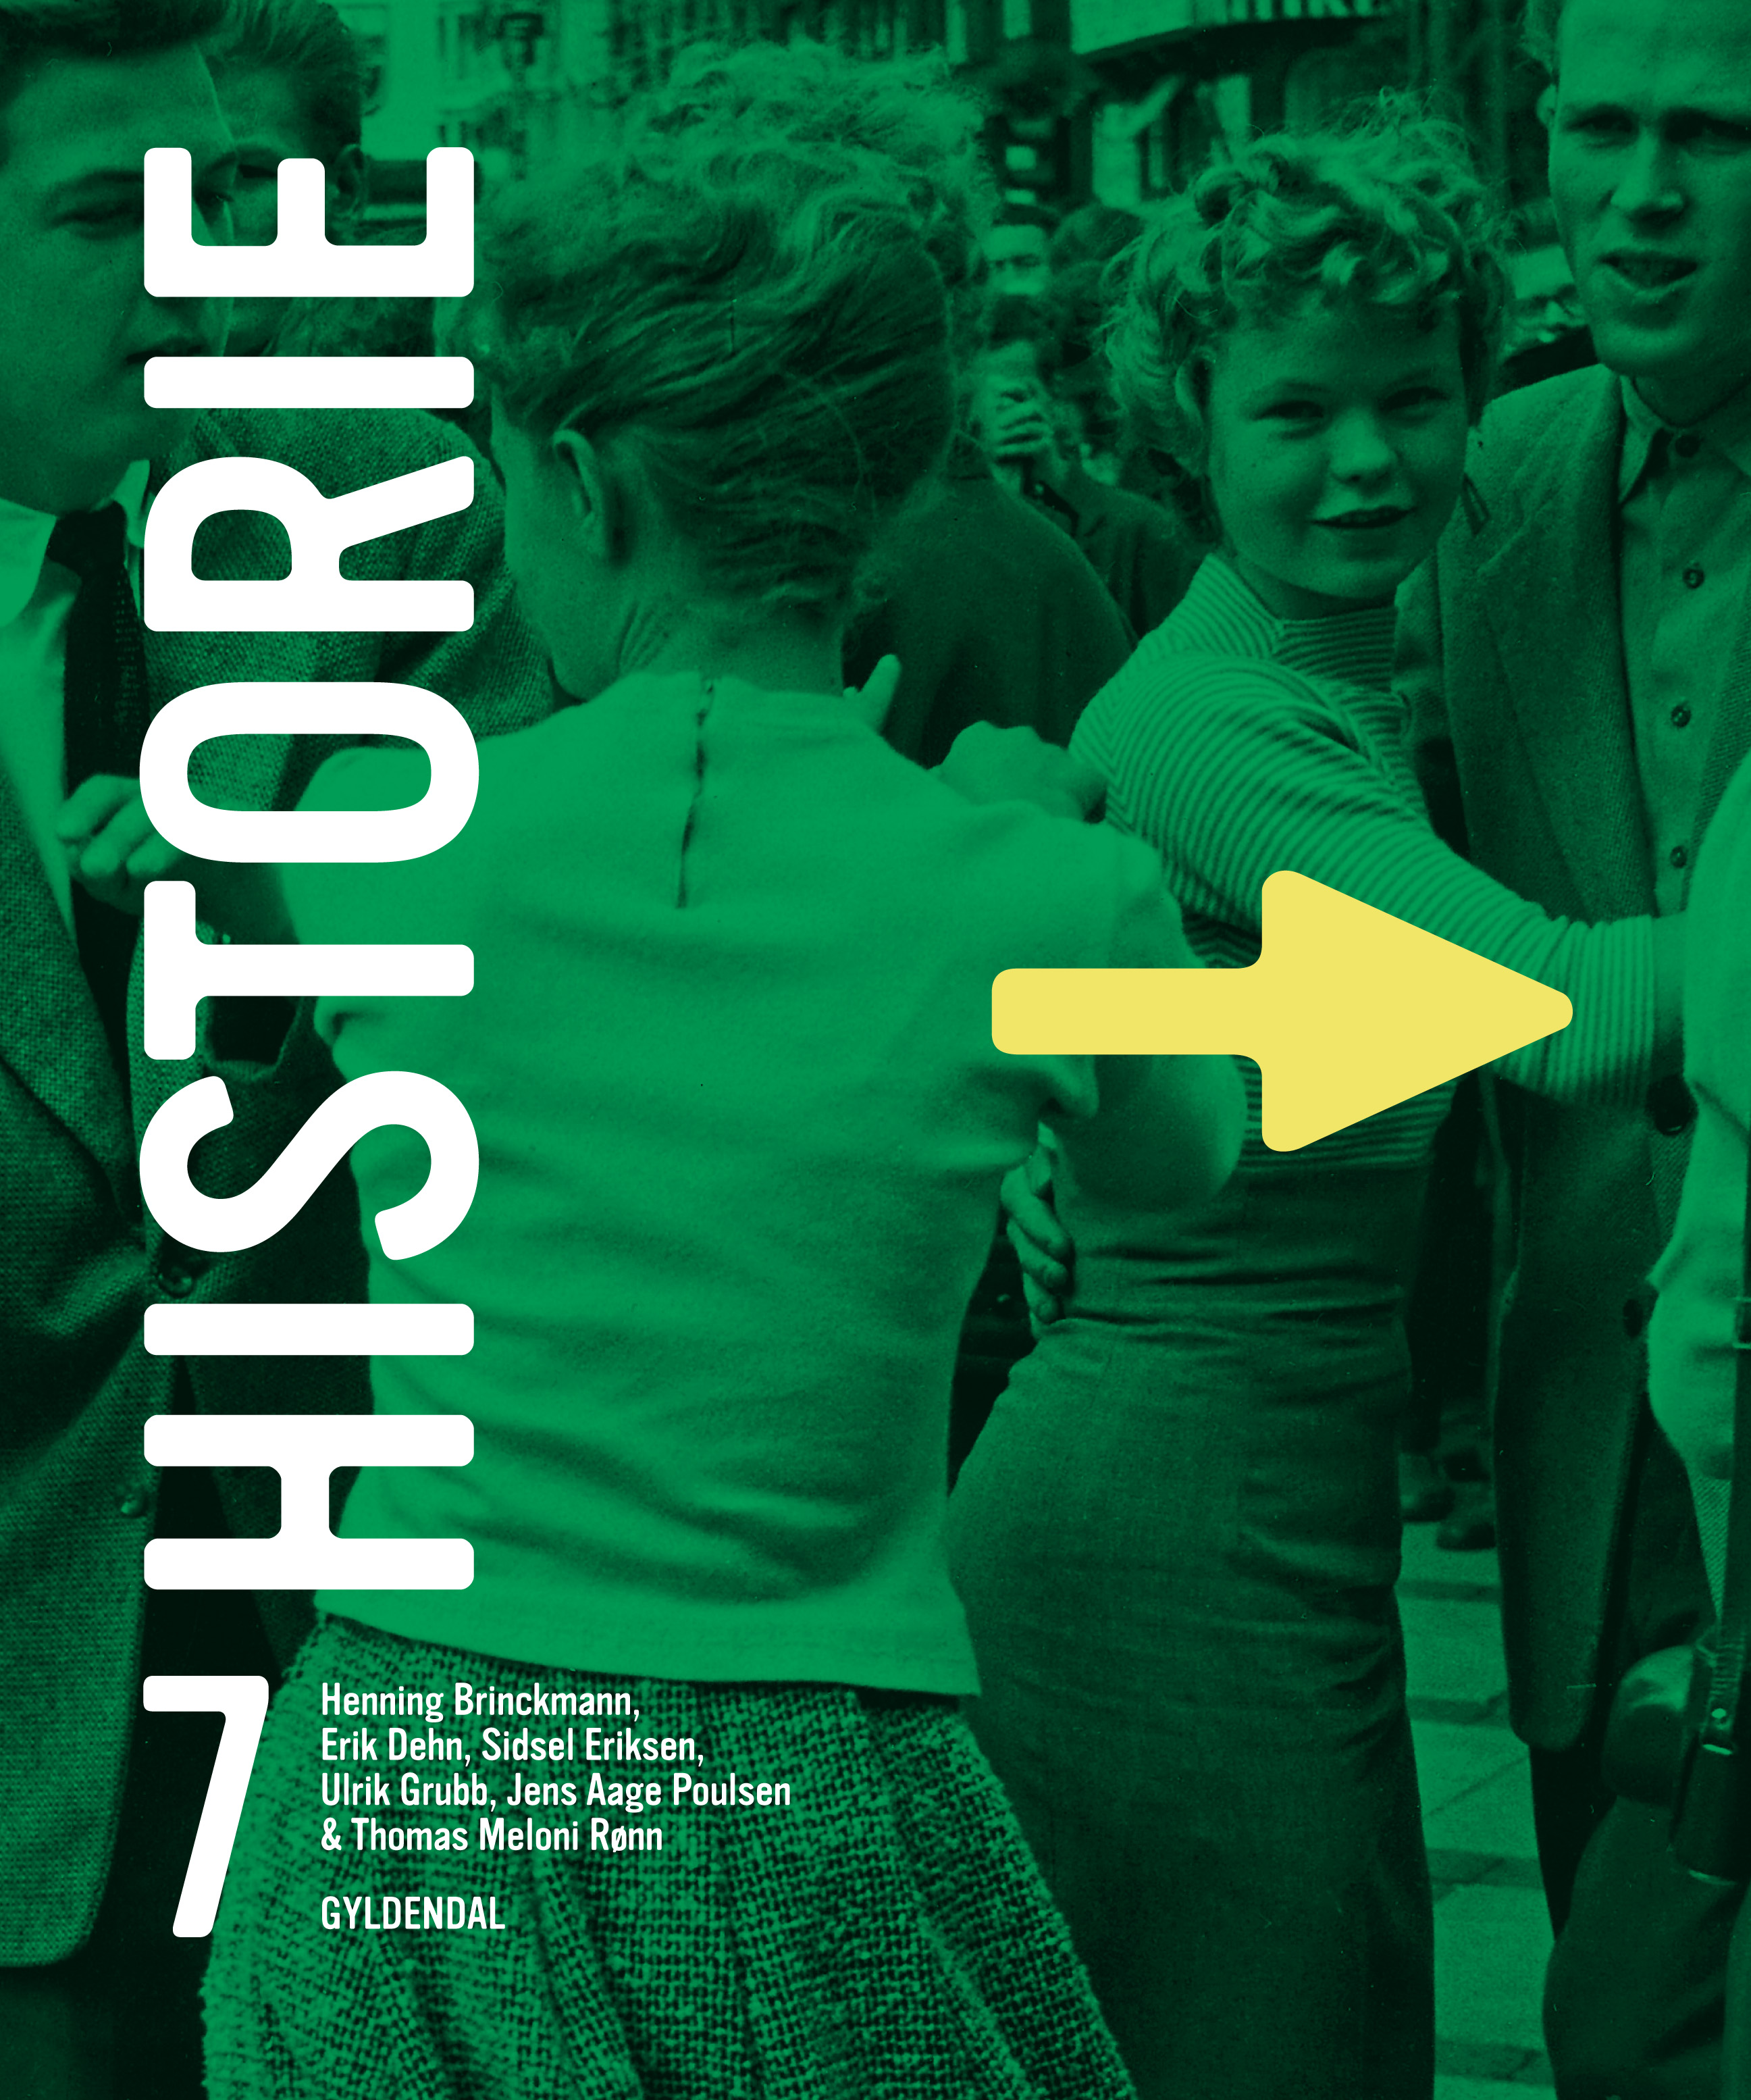 Historie 7 - Grundbog af Ulrik Grubb m.fl.